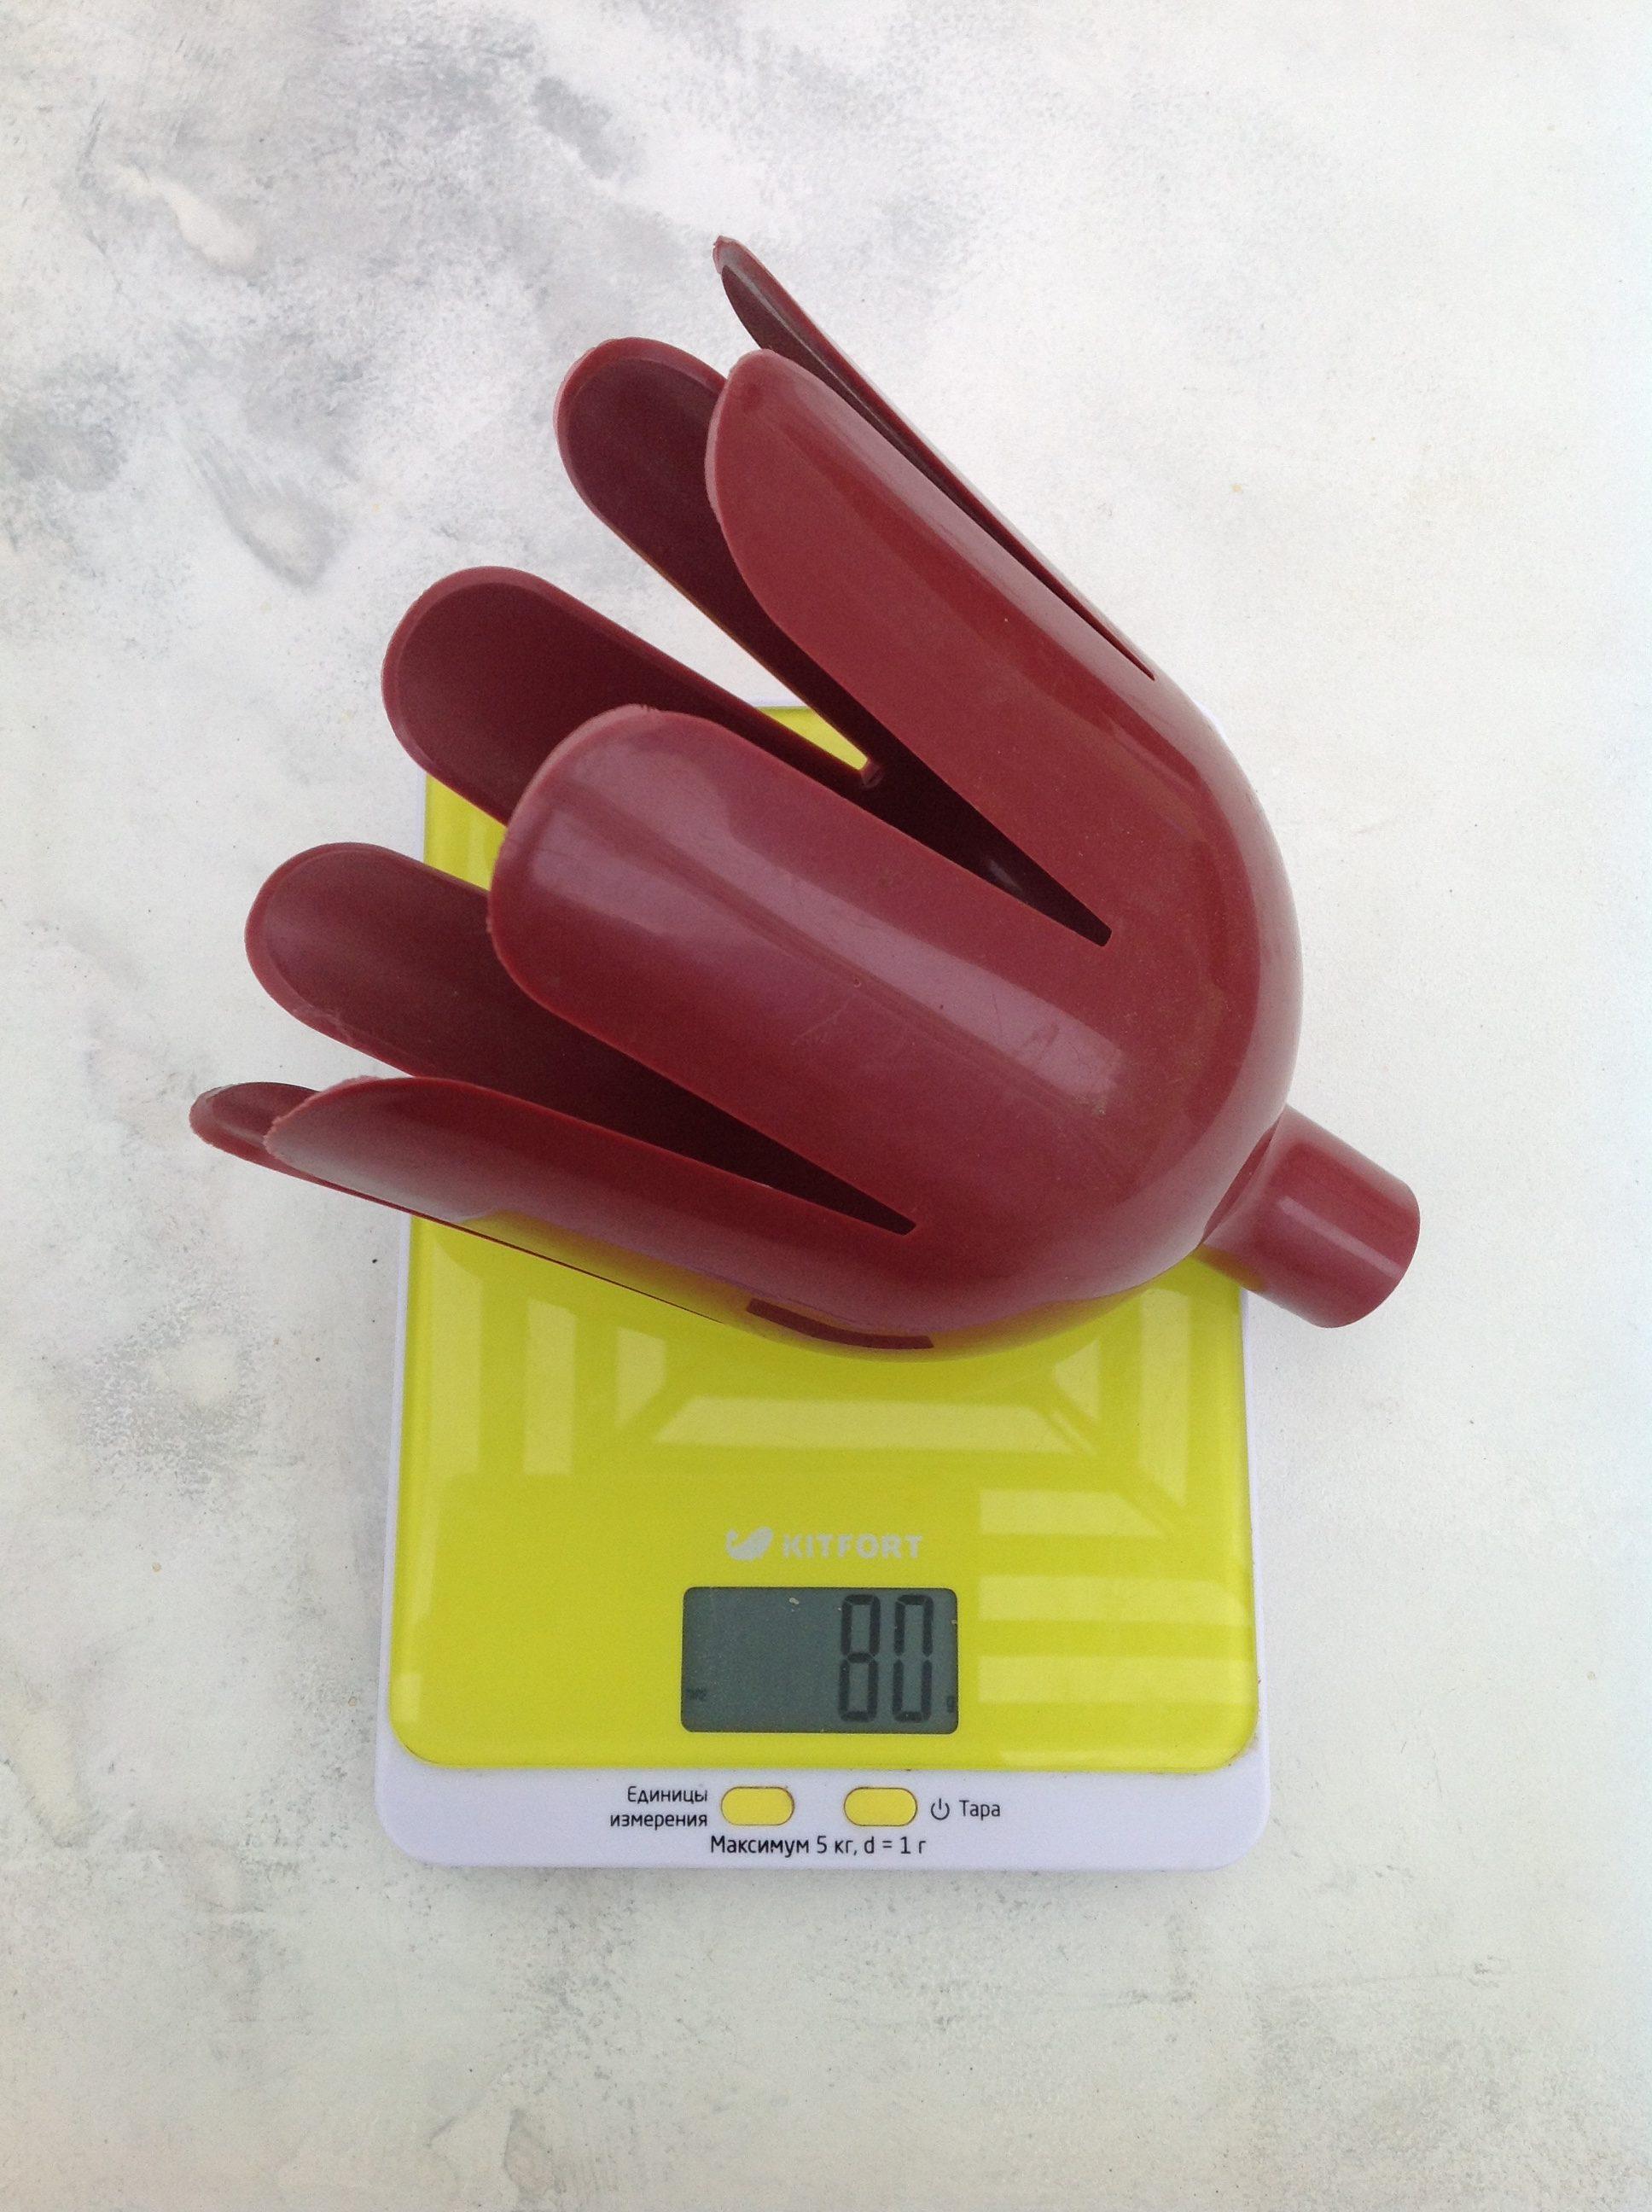 вес плодосъёмника для яблок